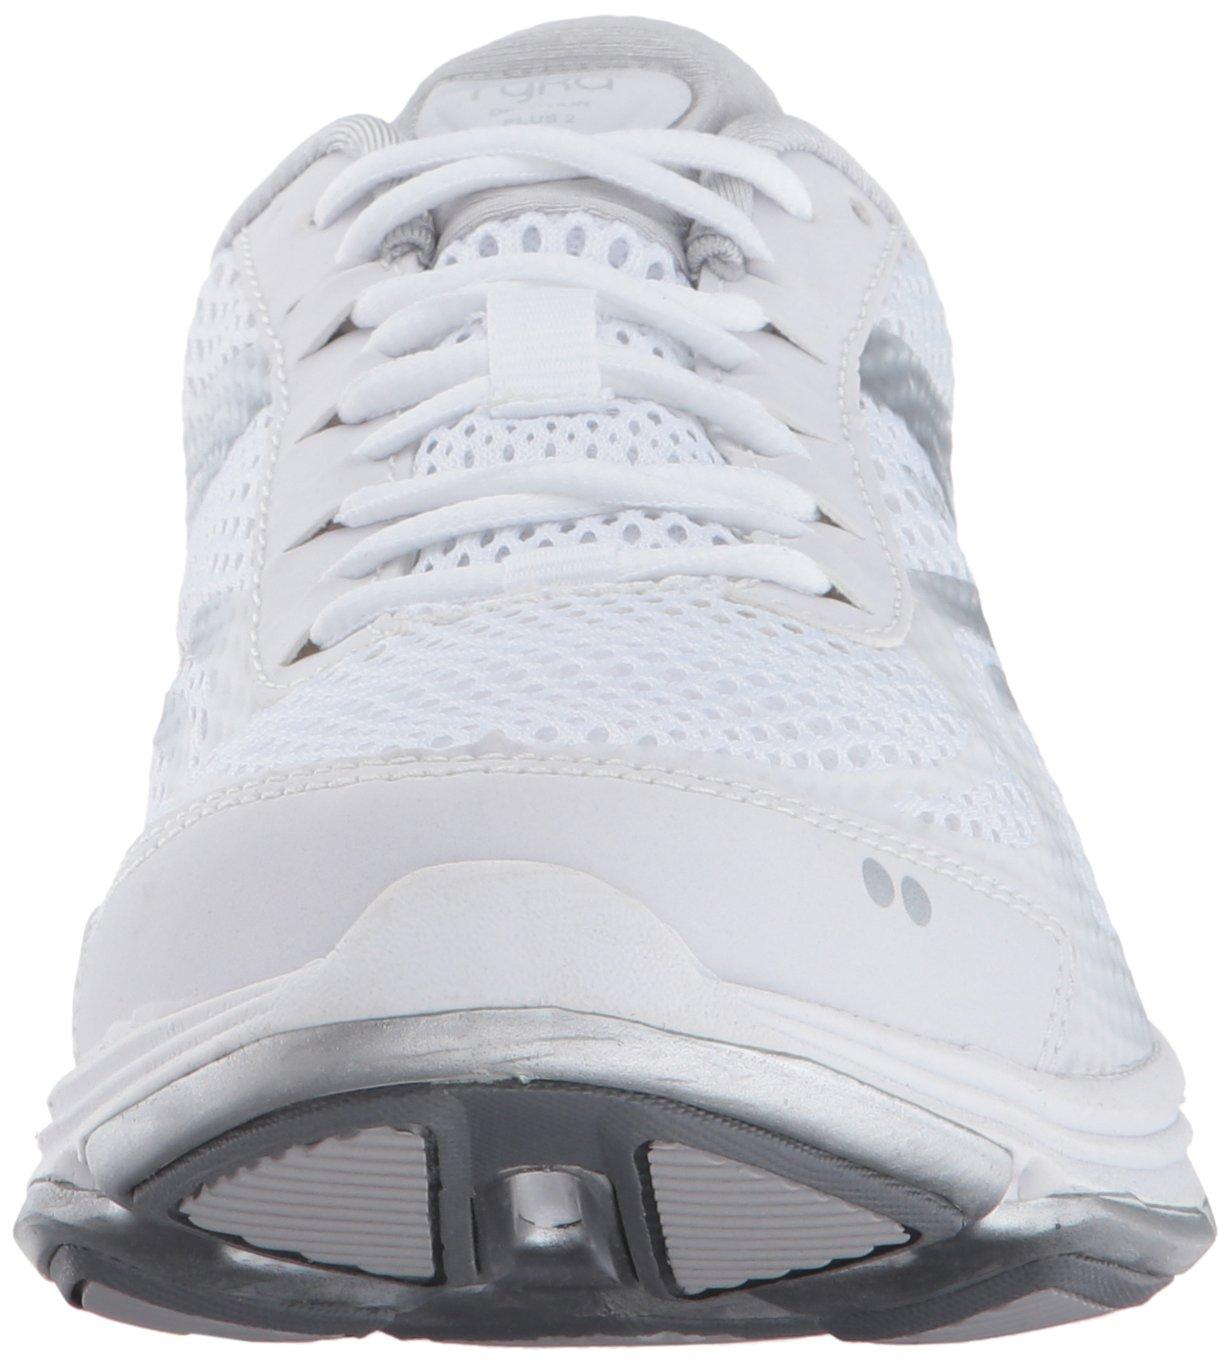 Ryka Women's Devo Plus 2 Walking Shoe B01N4WBYBP 8.5 B(M) US White/Blue